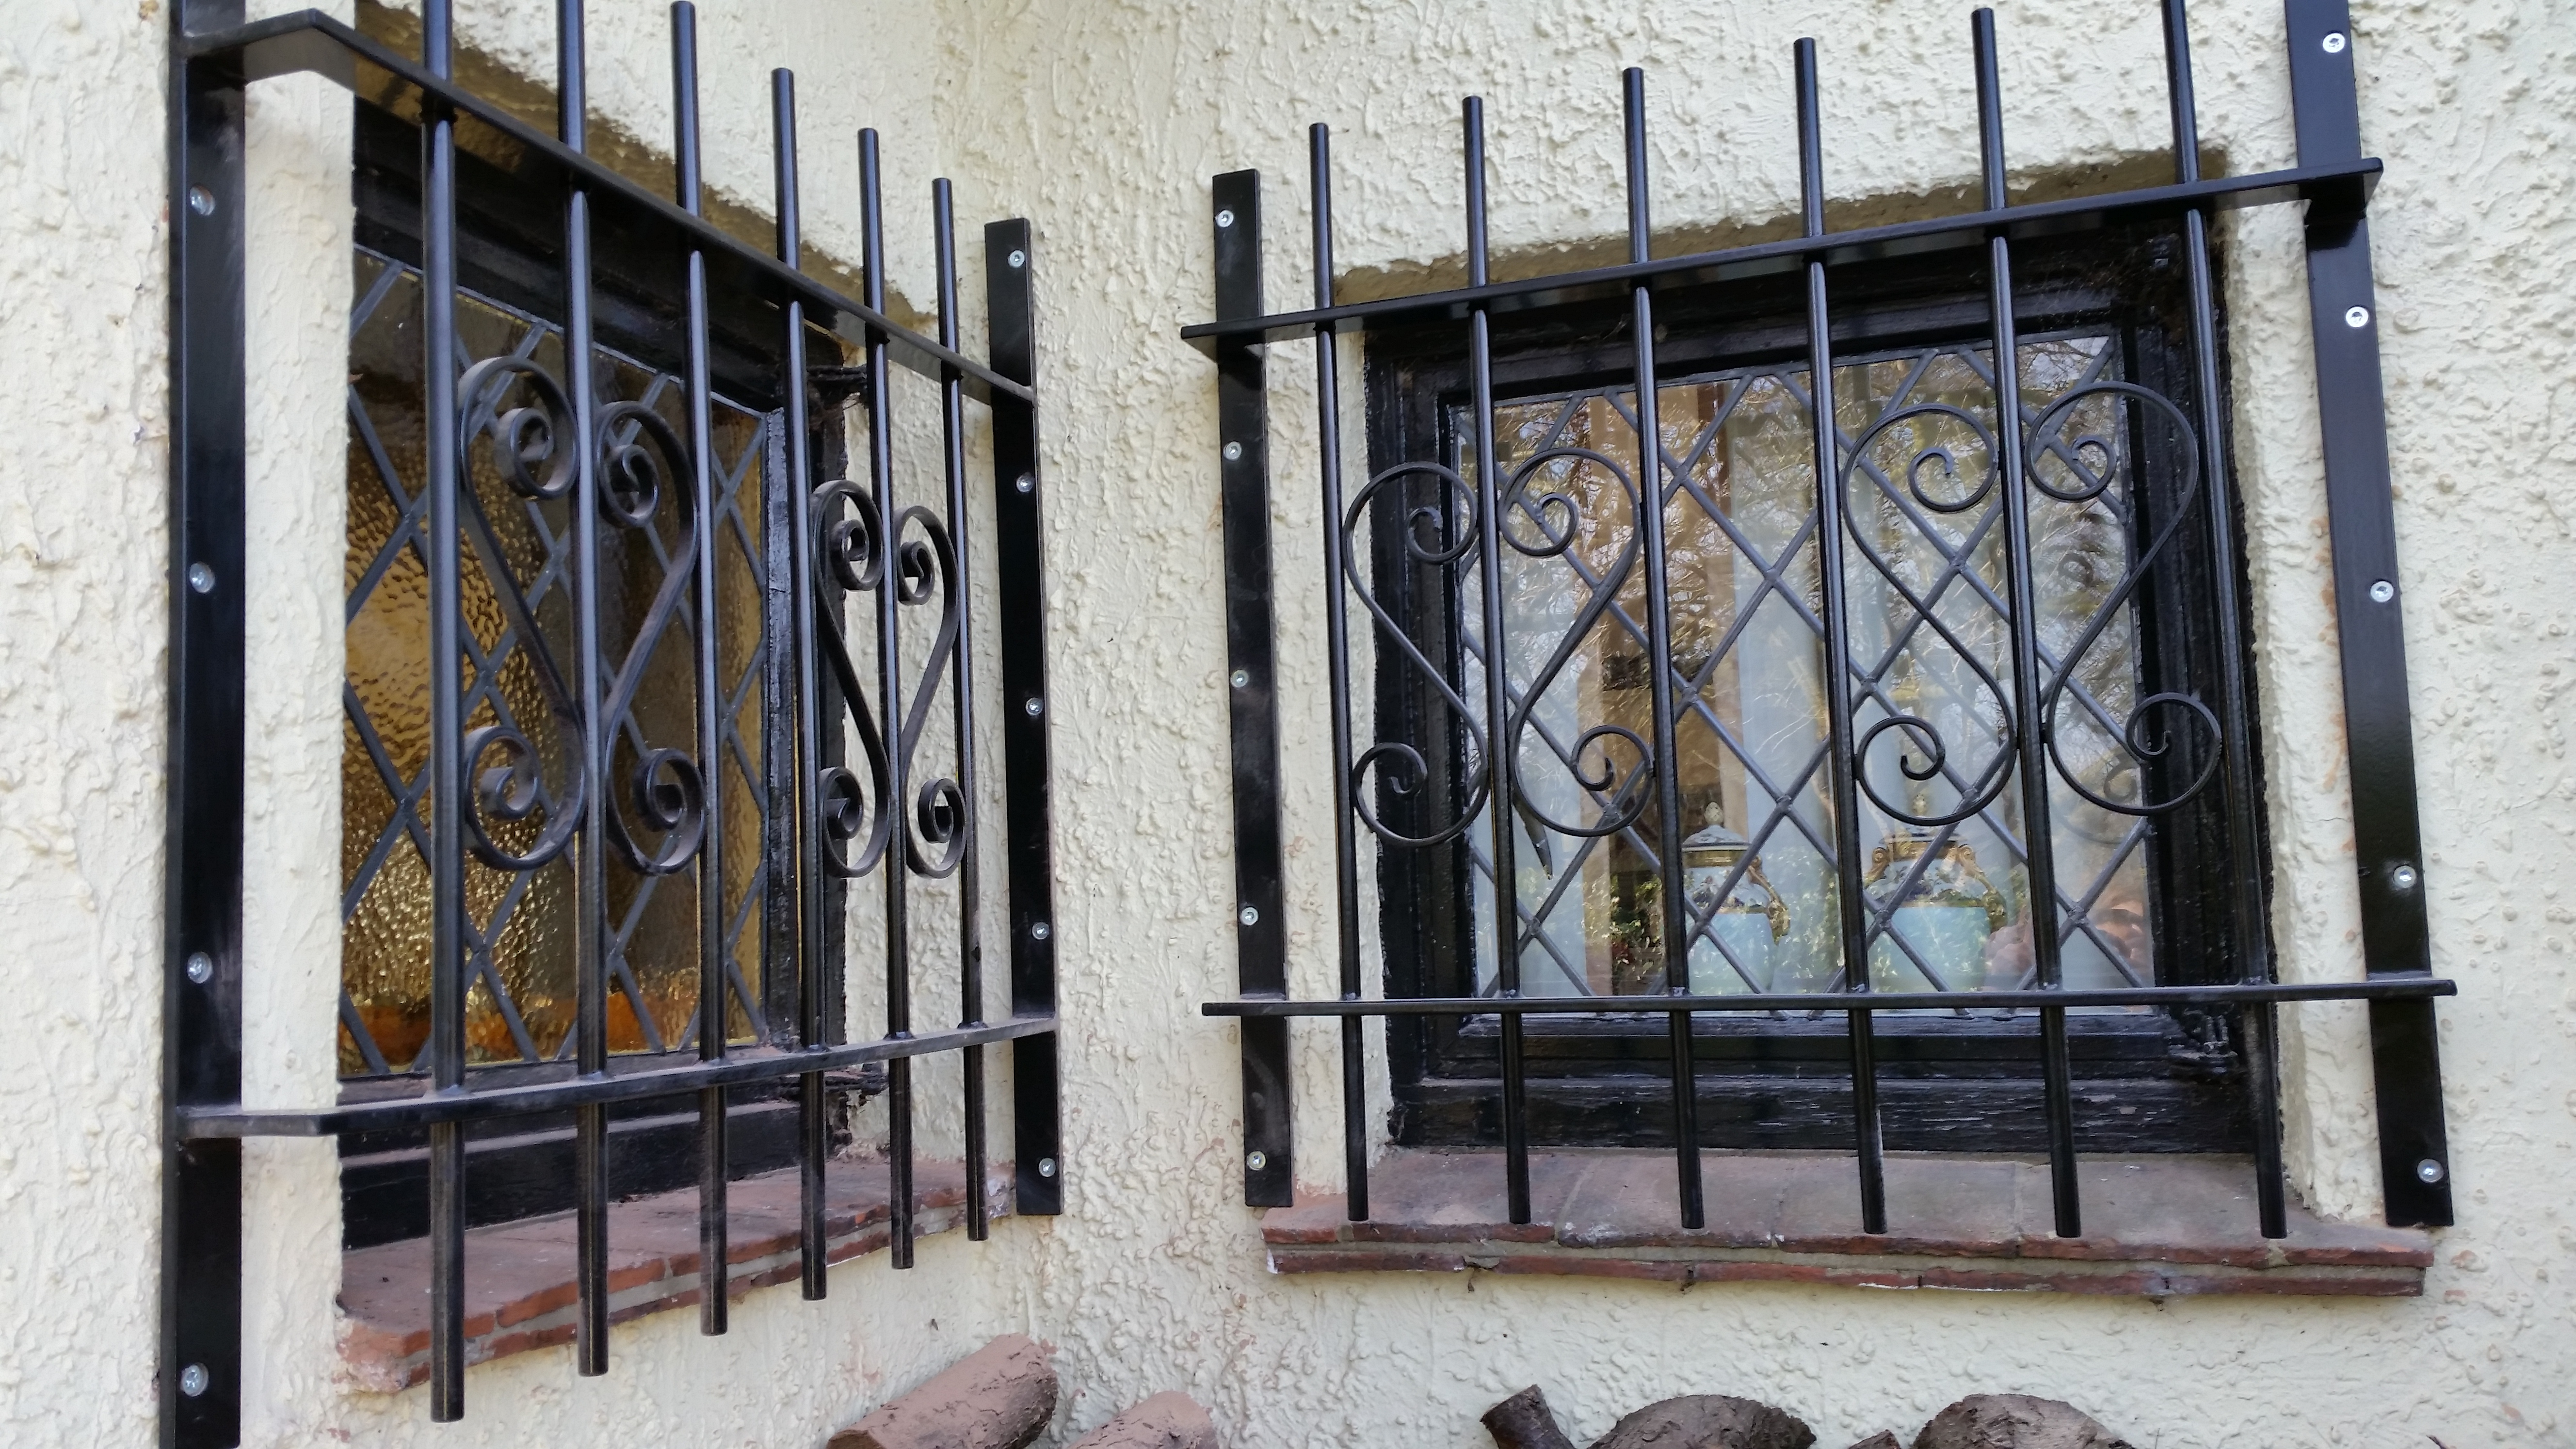 Burglar Bars And Doors Drathmore Shutters And Blinds